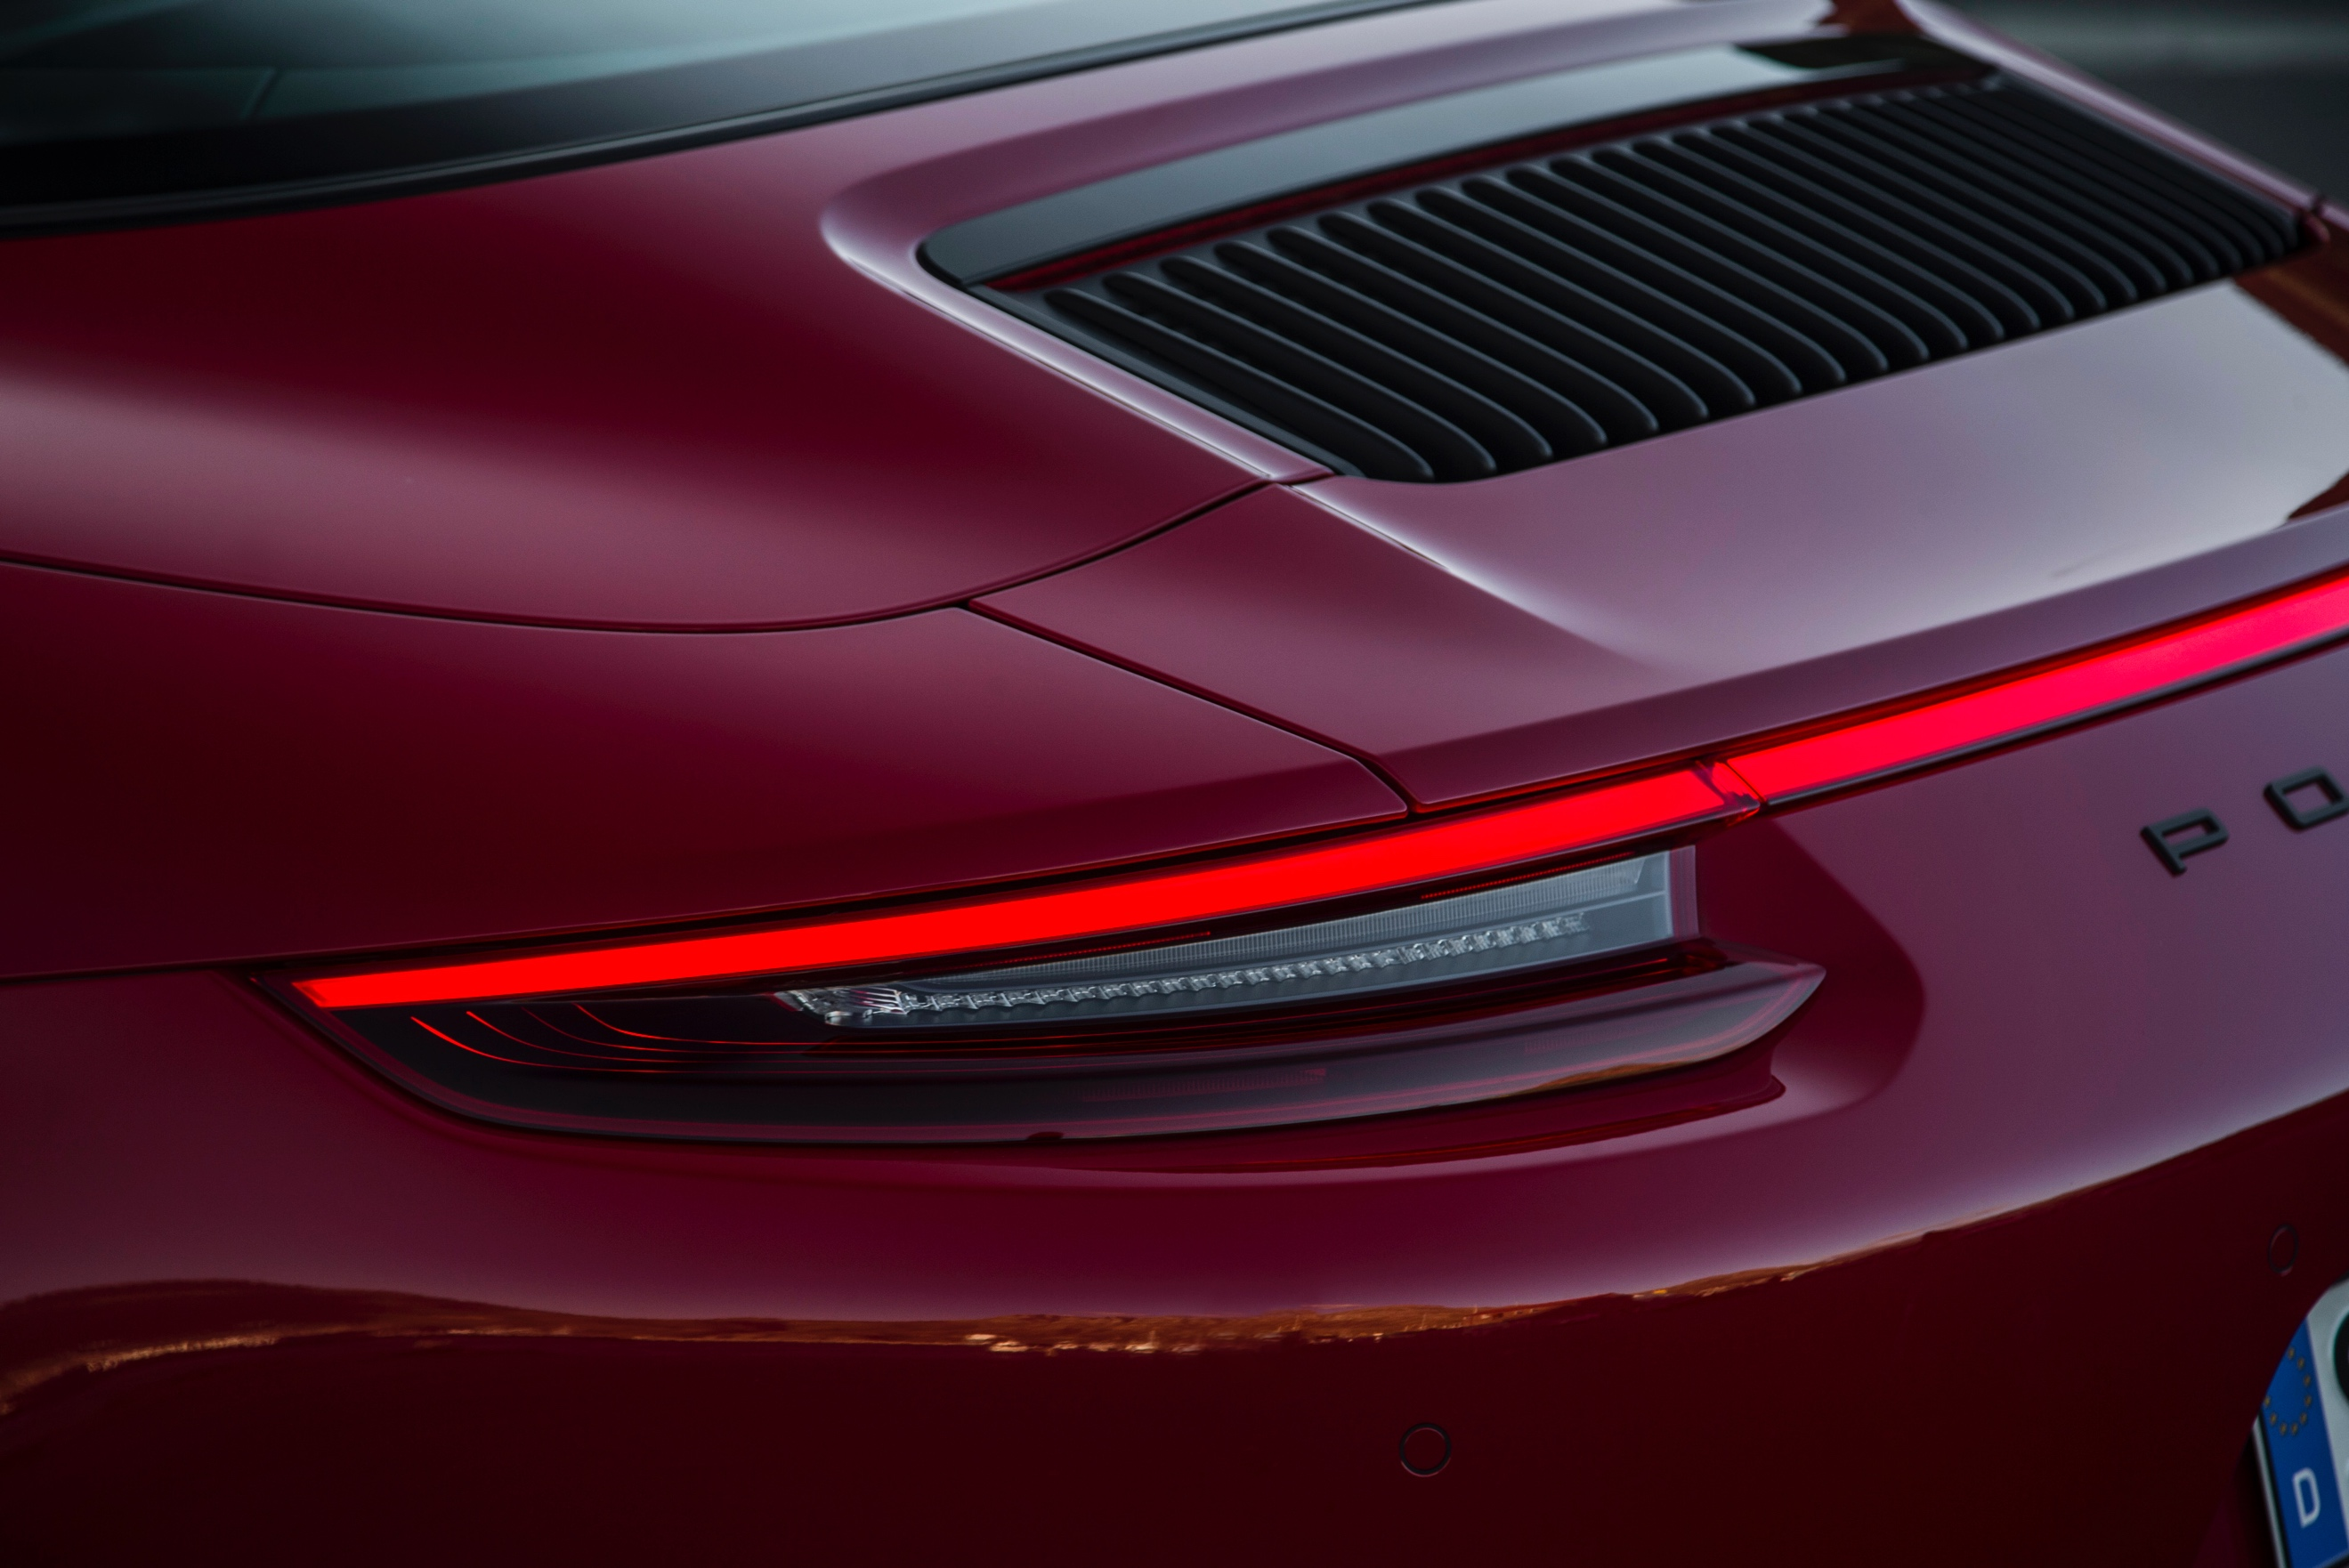 ../Porsche%20Press%20Kits/done/00003_911GTSLaunch/29r8967_high.jpg